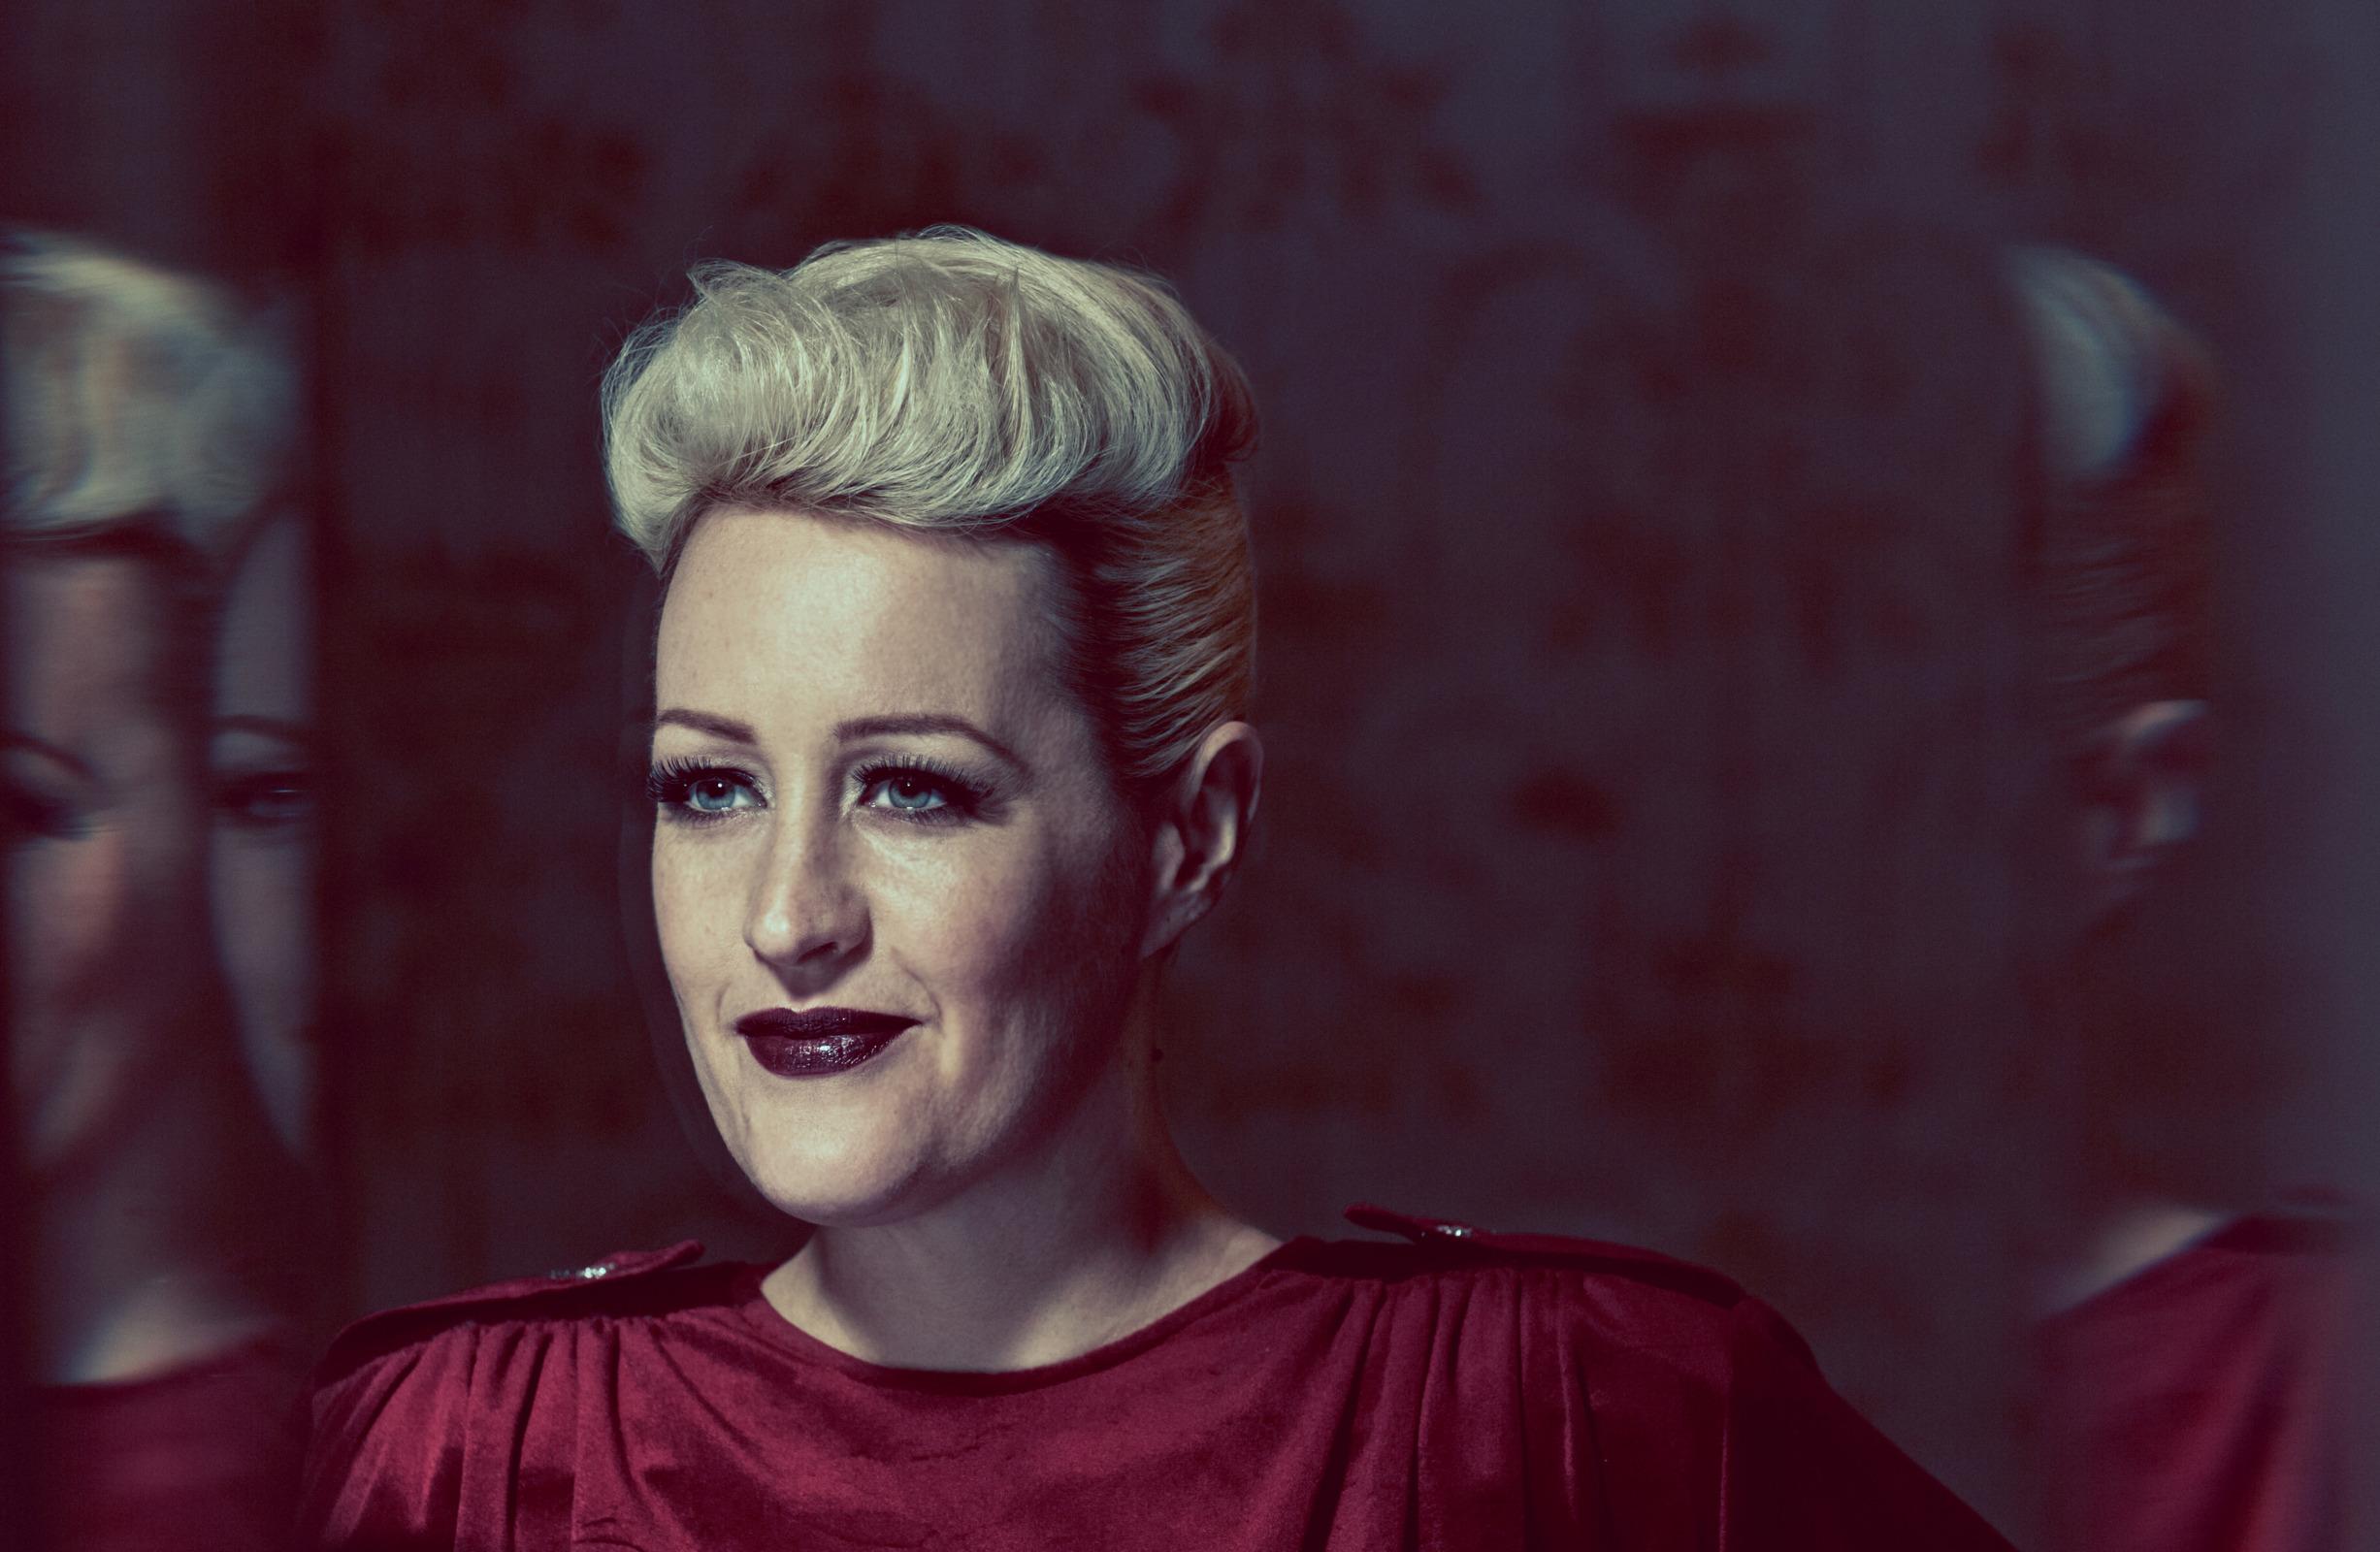 Vuelve la reina del soul británico: Alice Russell presenta Heartbreaker